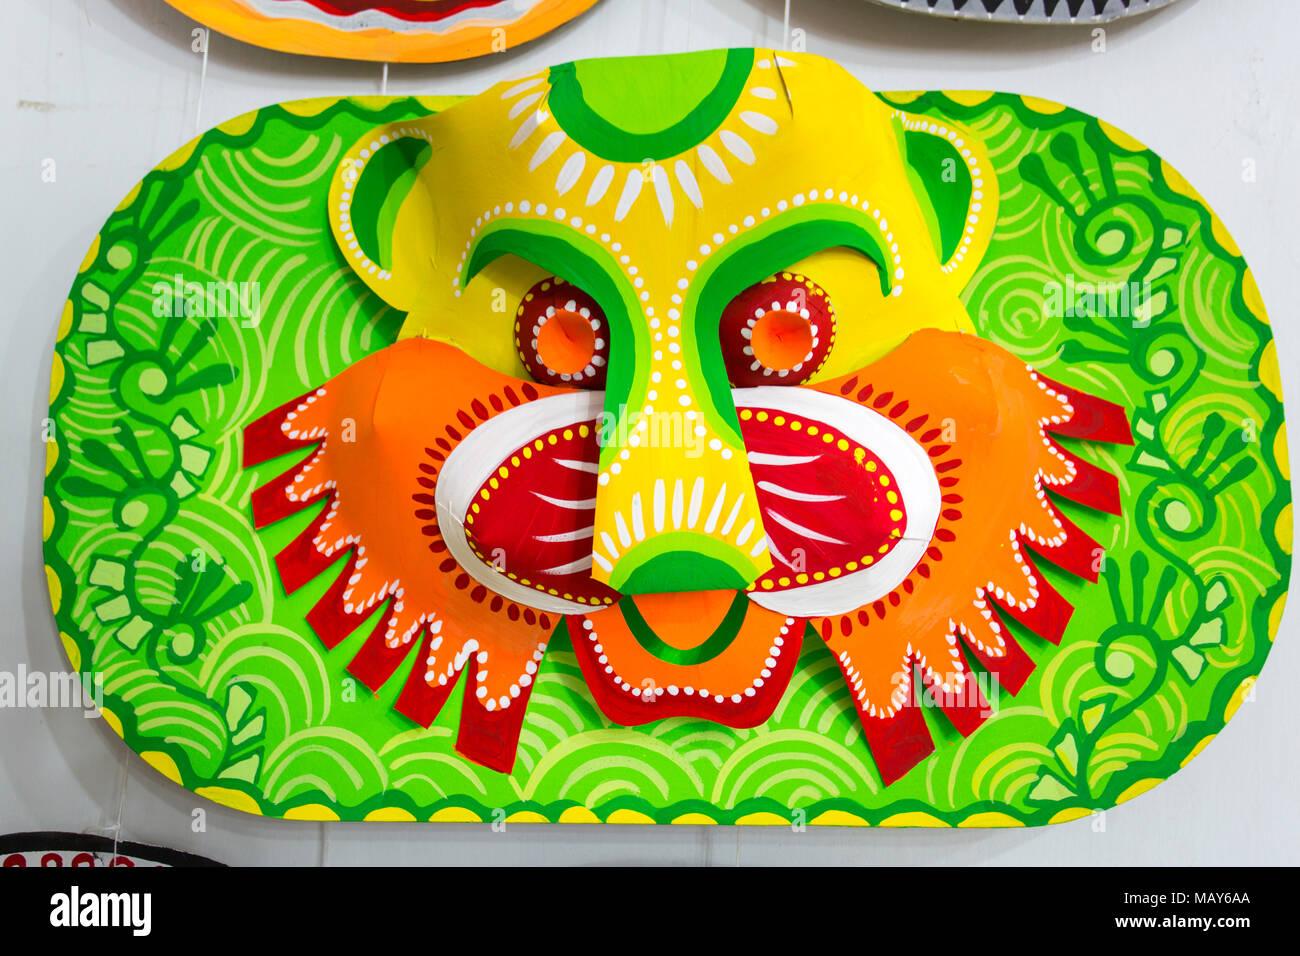 Bangla Calendar Stock Photos & Bangla Calendar Stock Images